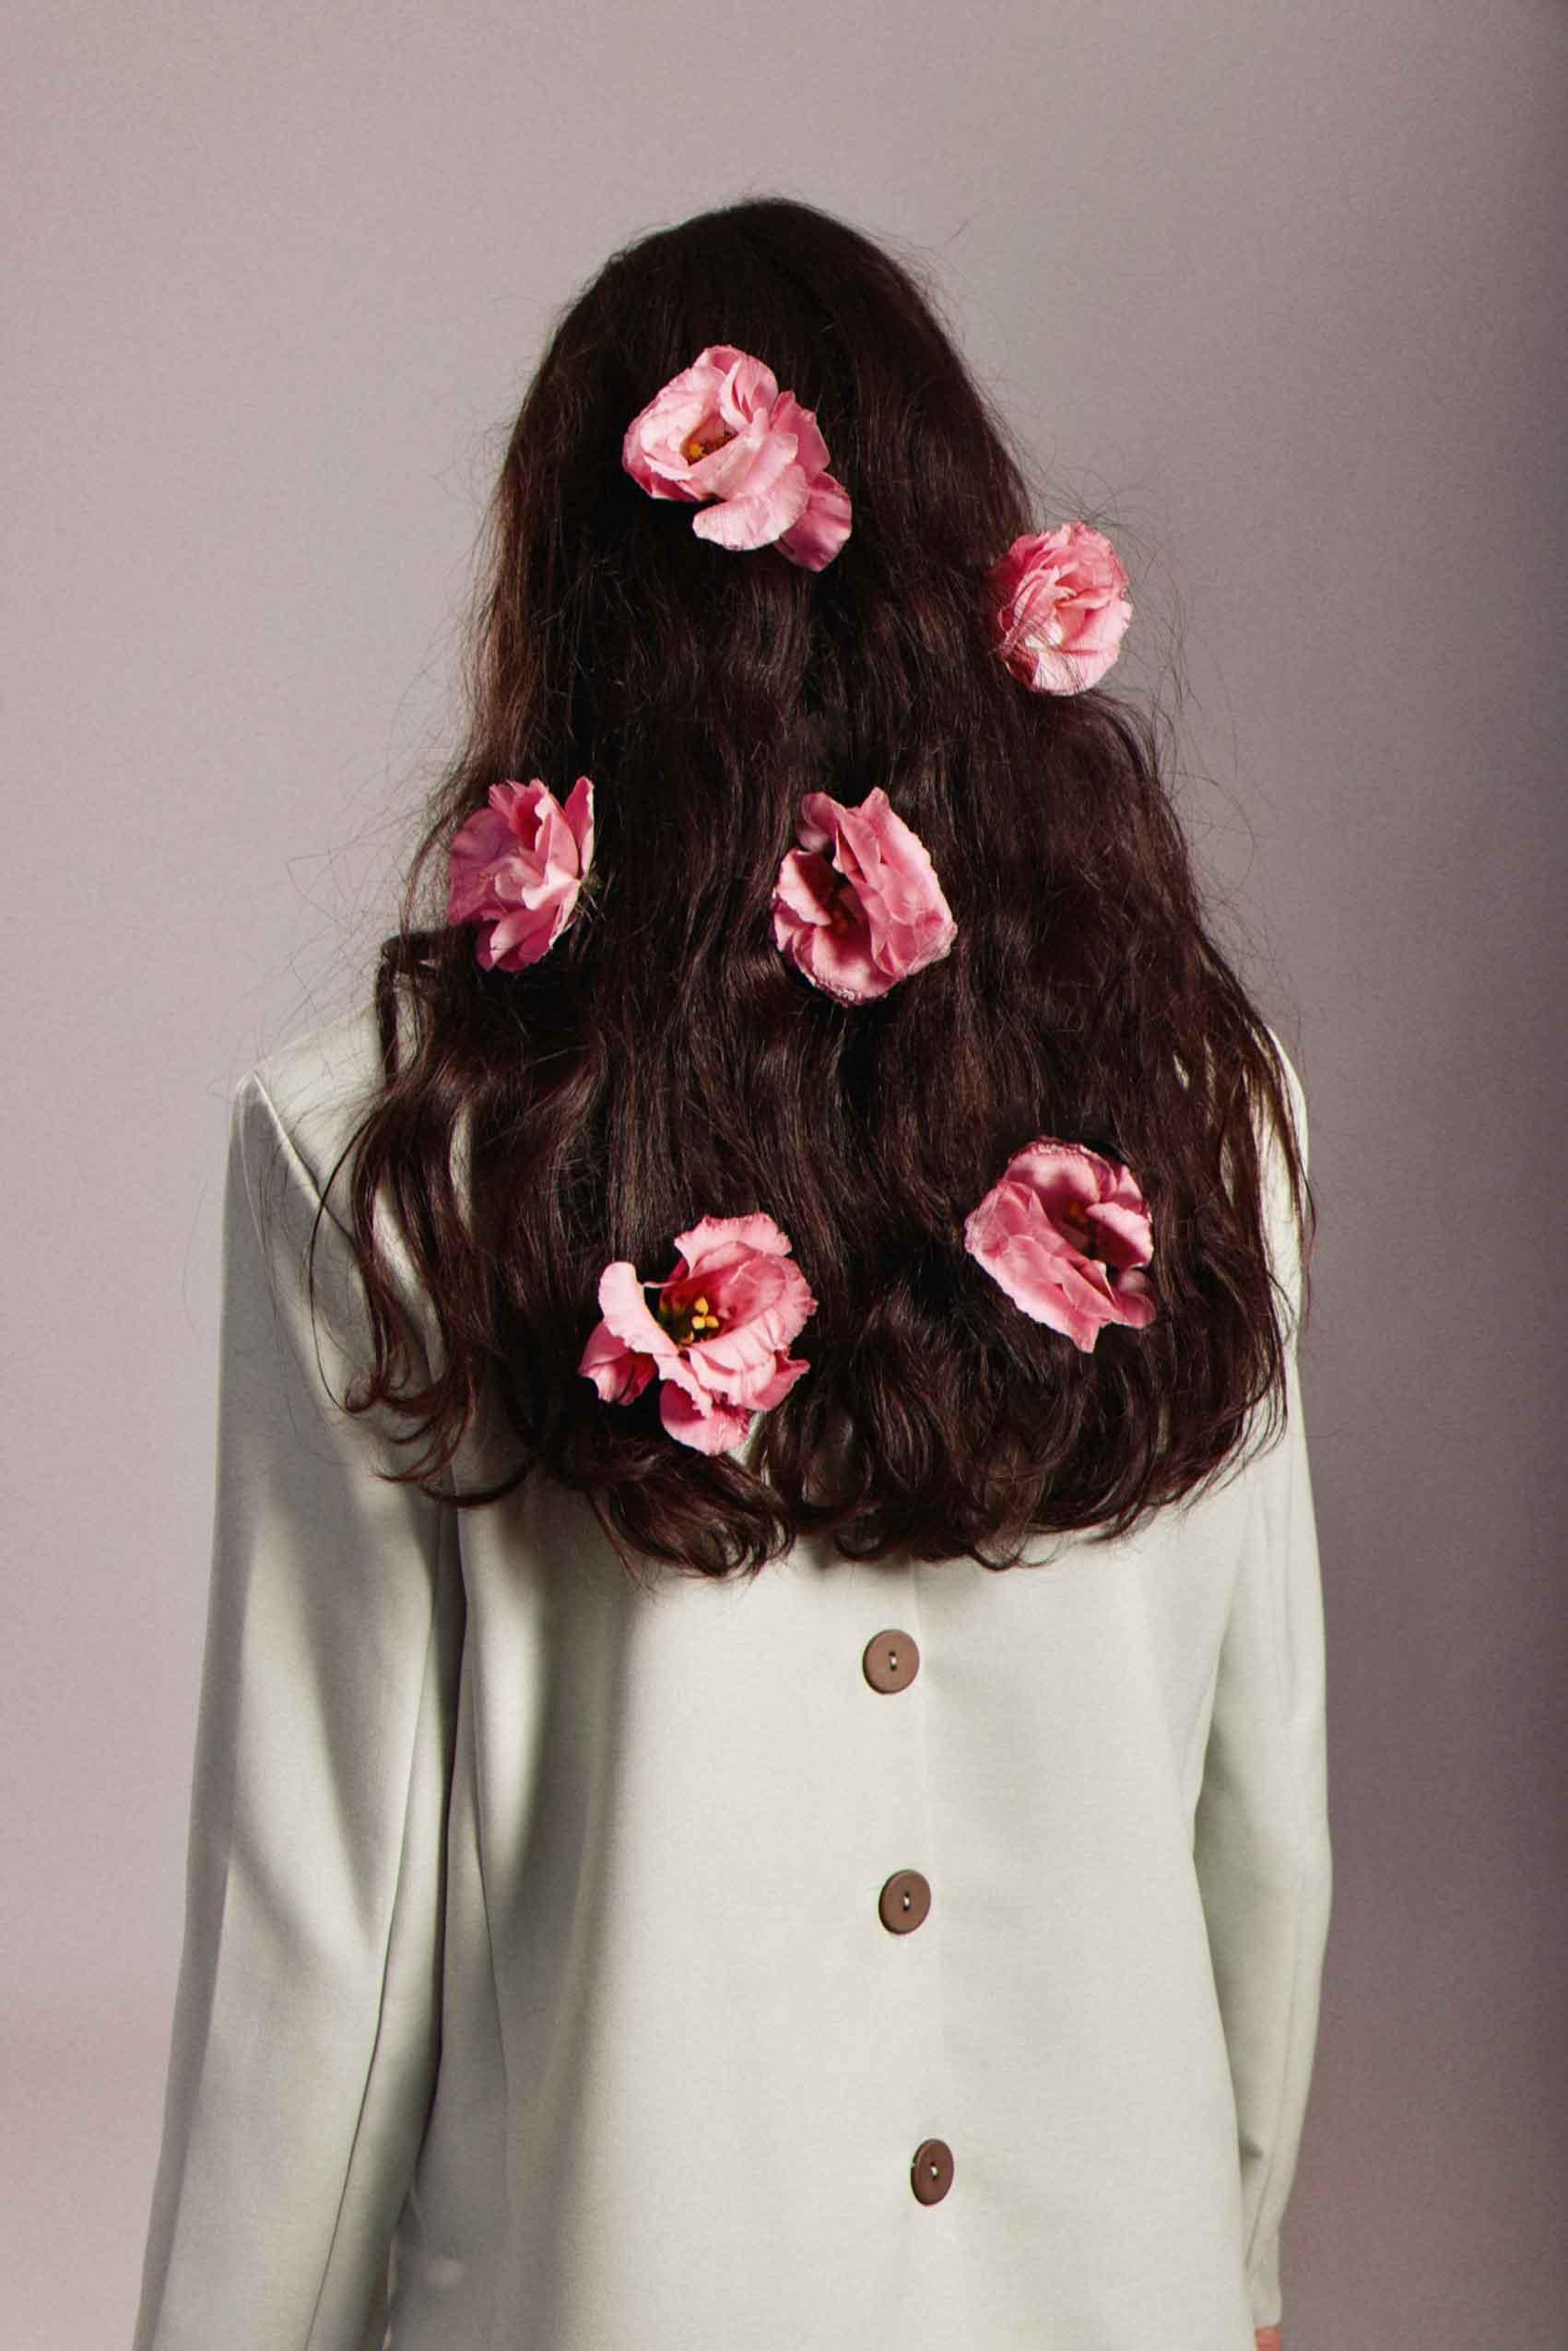 Photographer- Oz Shemesh, Styling - Maor Rabin, Hair - Maor kidushim Agency - yuligroup - Fashion Israel - מגזין אופנה ישראלי-12